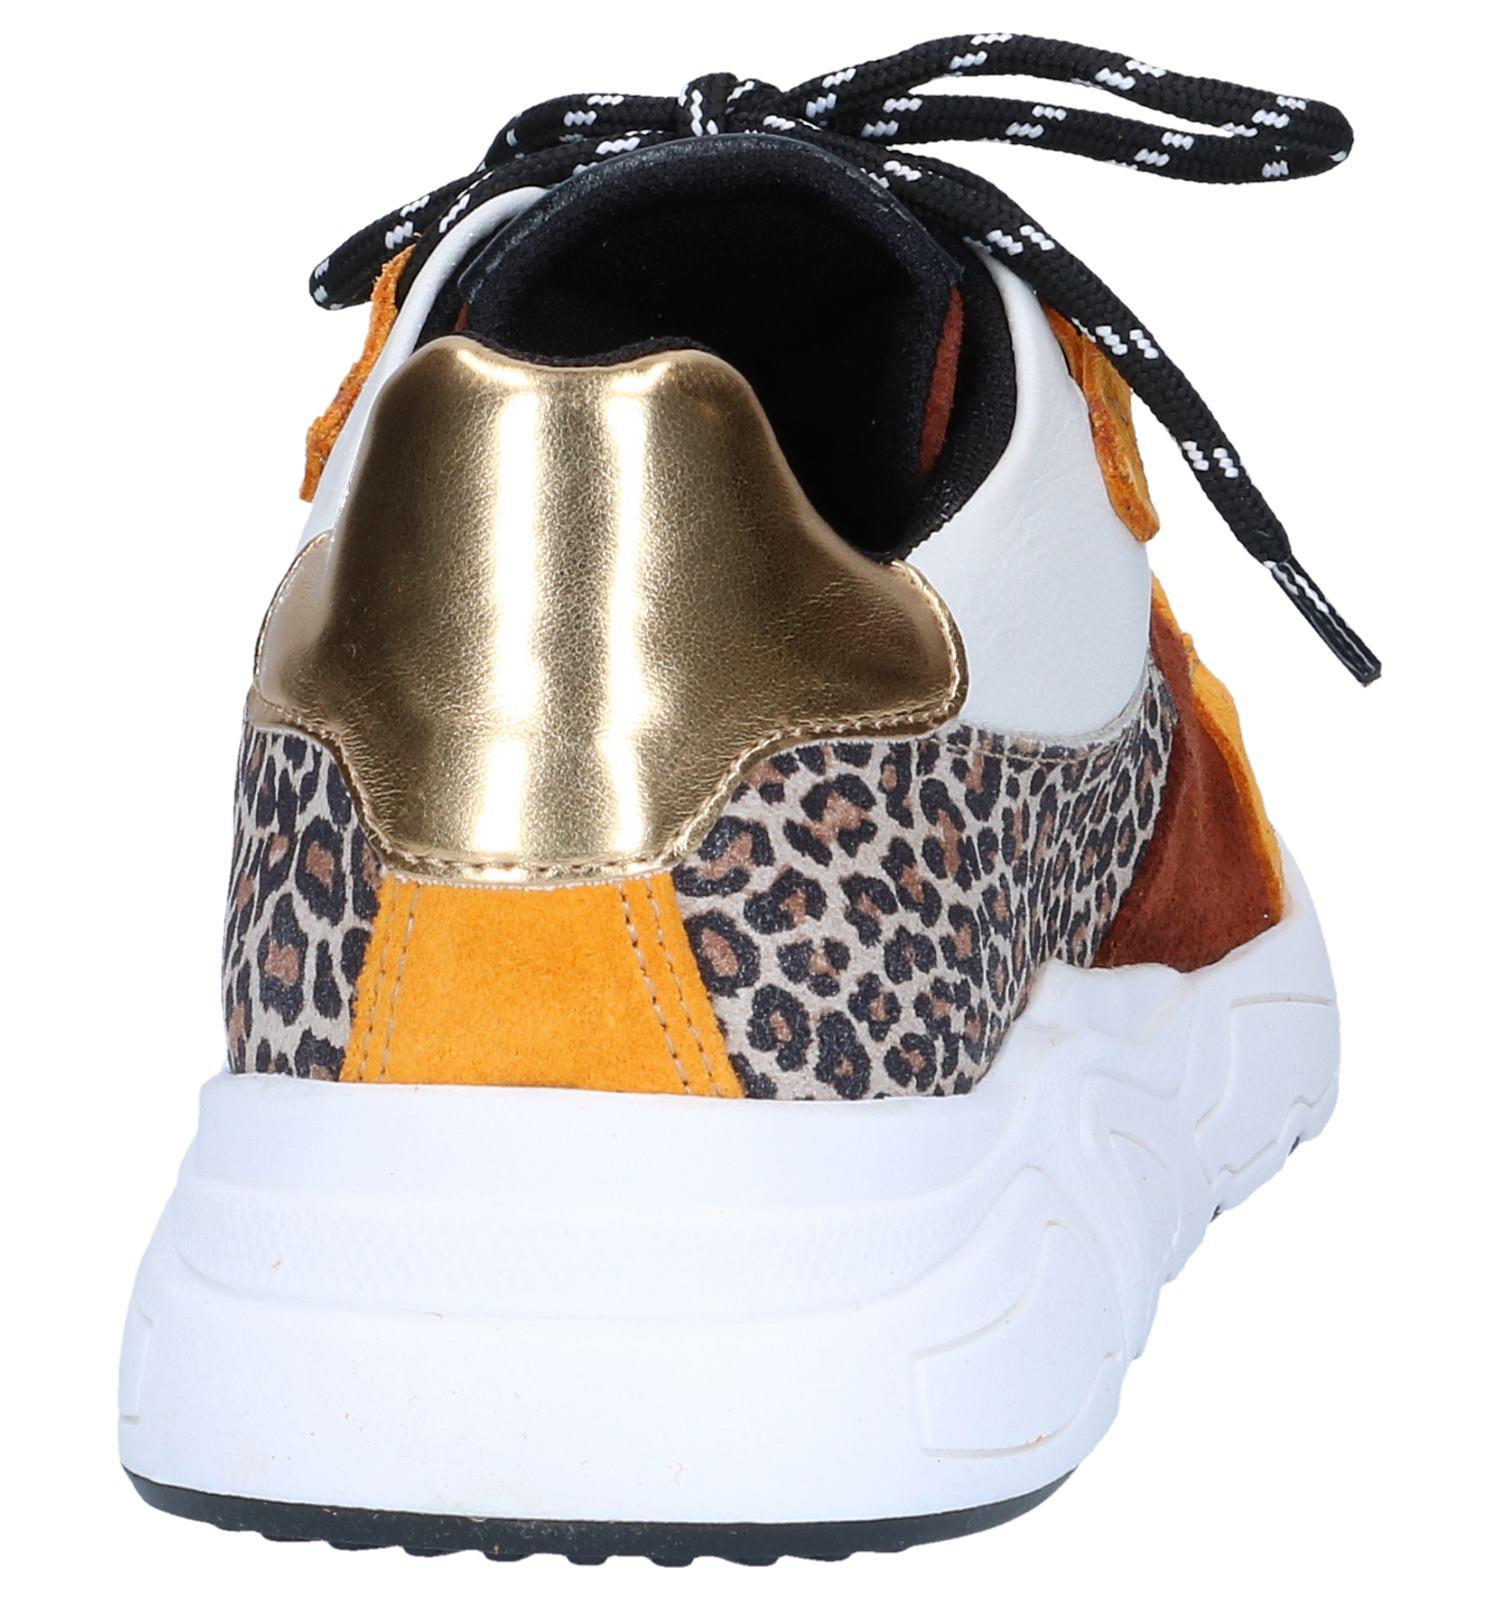 Sneakers Sneakers Poelman Multicolor Multicolor Poelman Multicolor Poelman Multicolor Sneakers Multicolor Sneakers Poelman ZkuTwOPXil